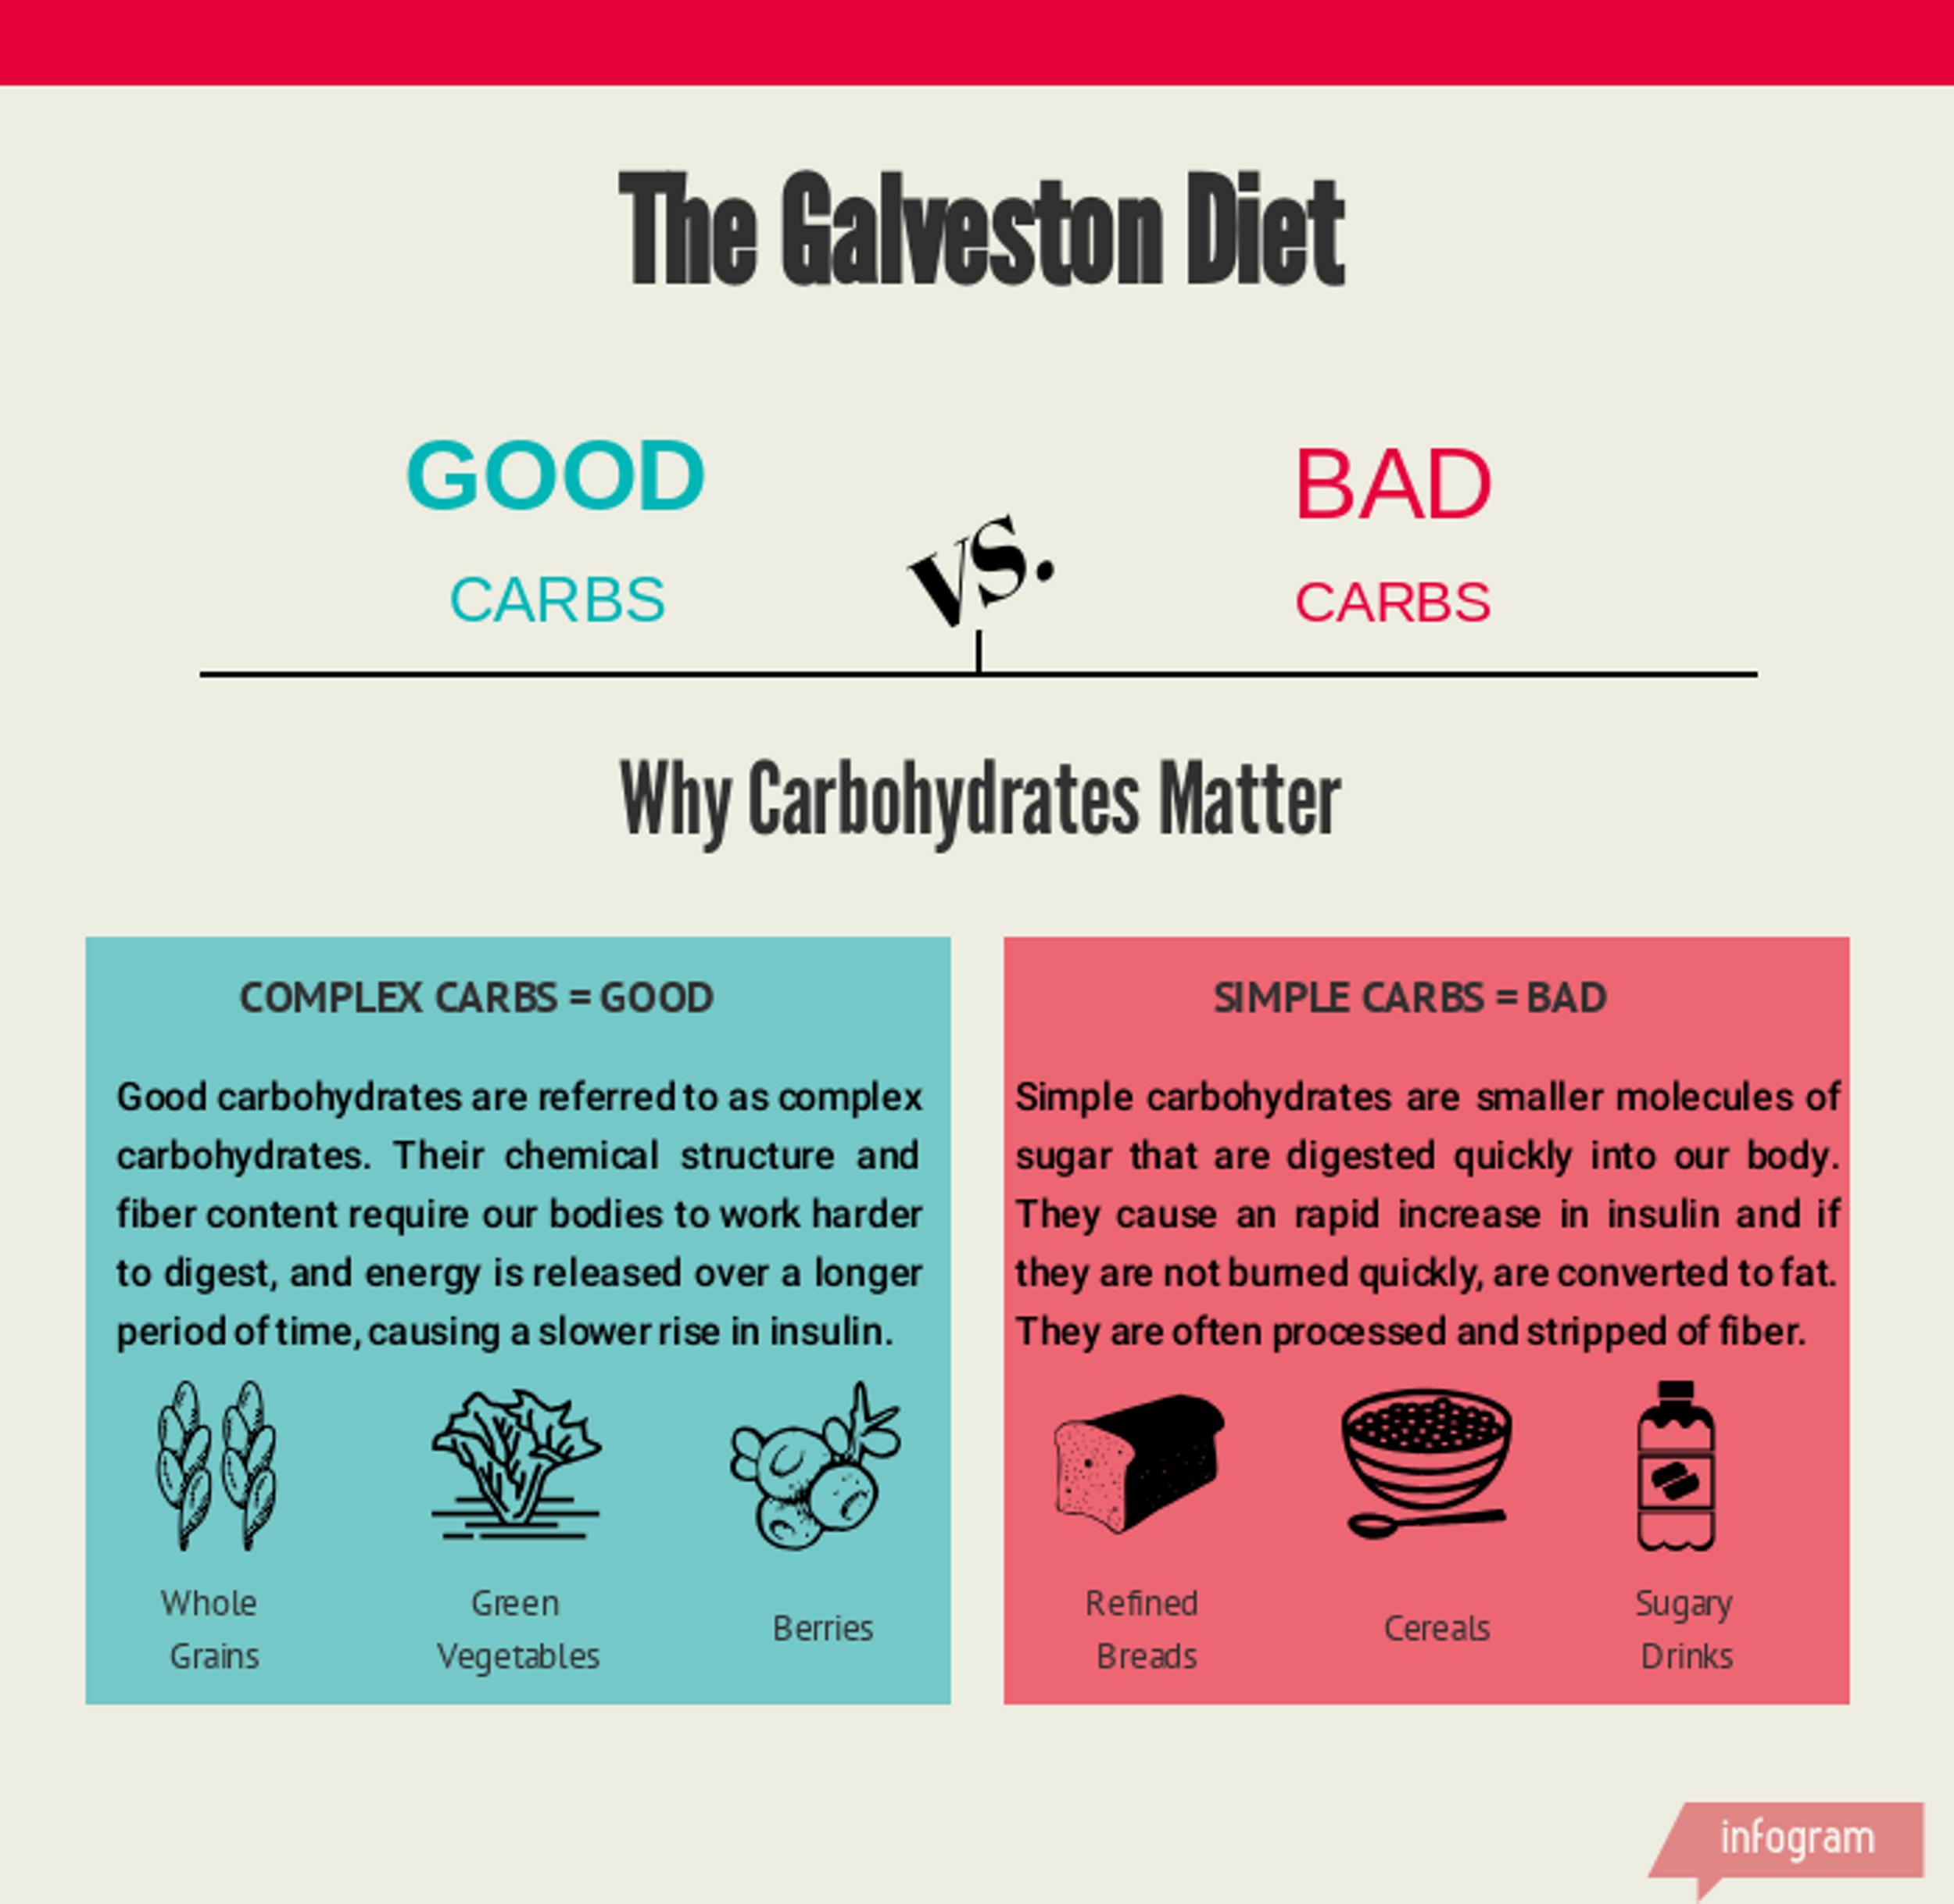 galveston diet intermittent fasting